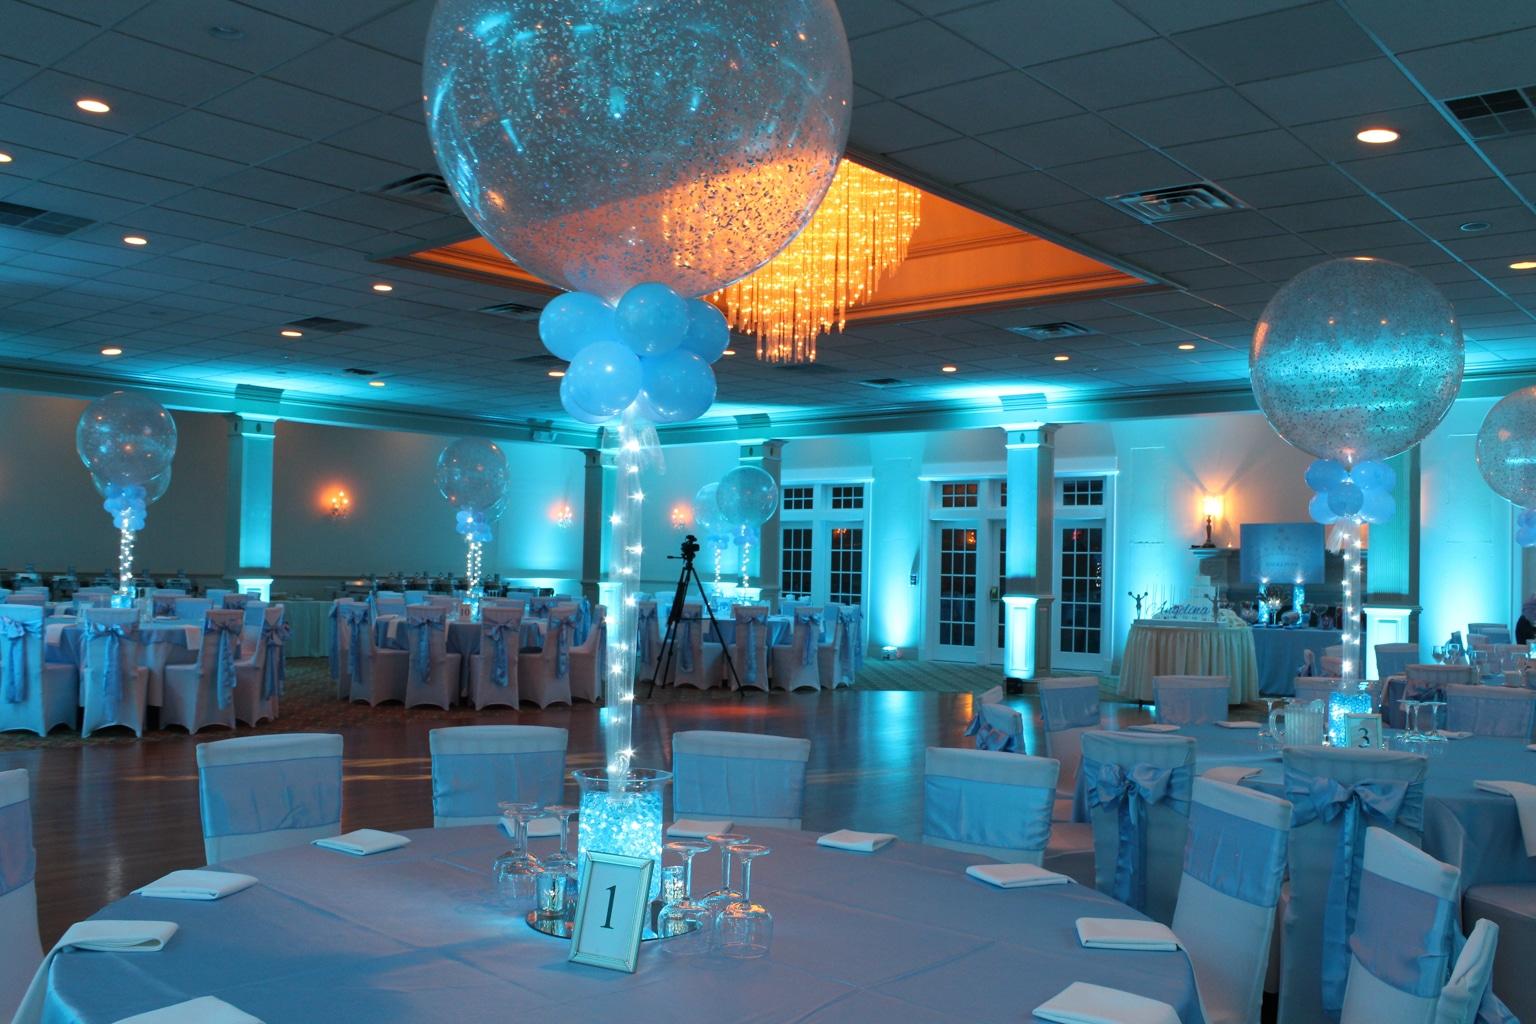 Aqua gems centerpieces balloon artistry for Balloon decoration ideas for sweet 16